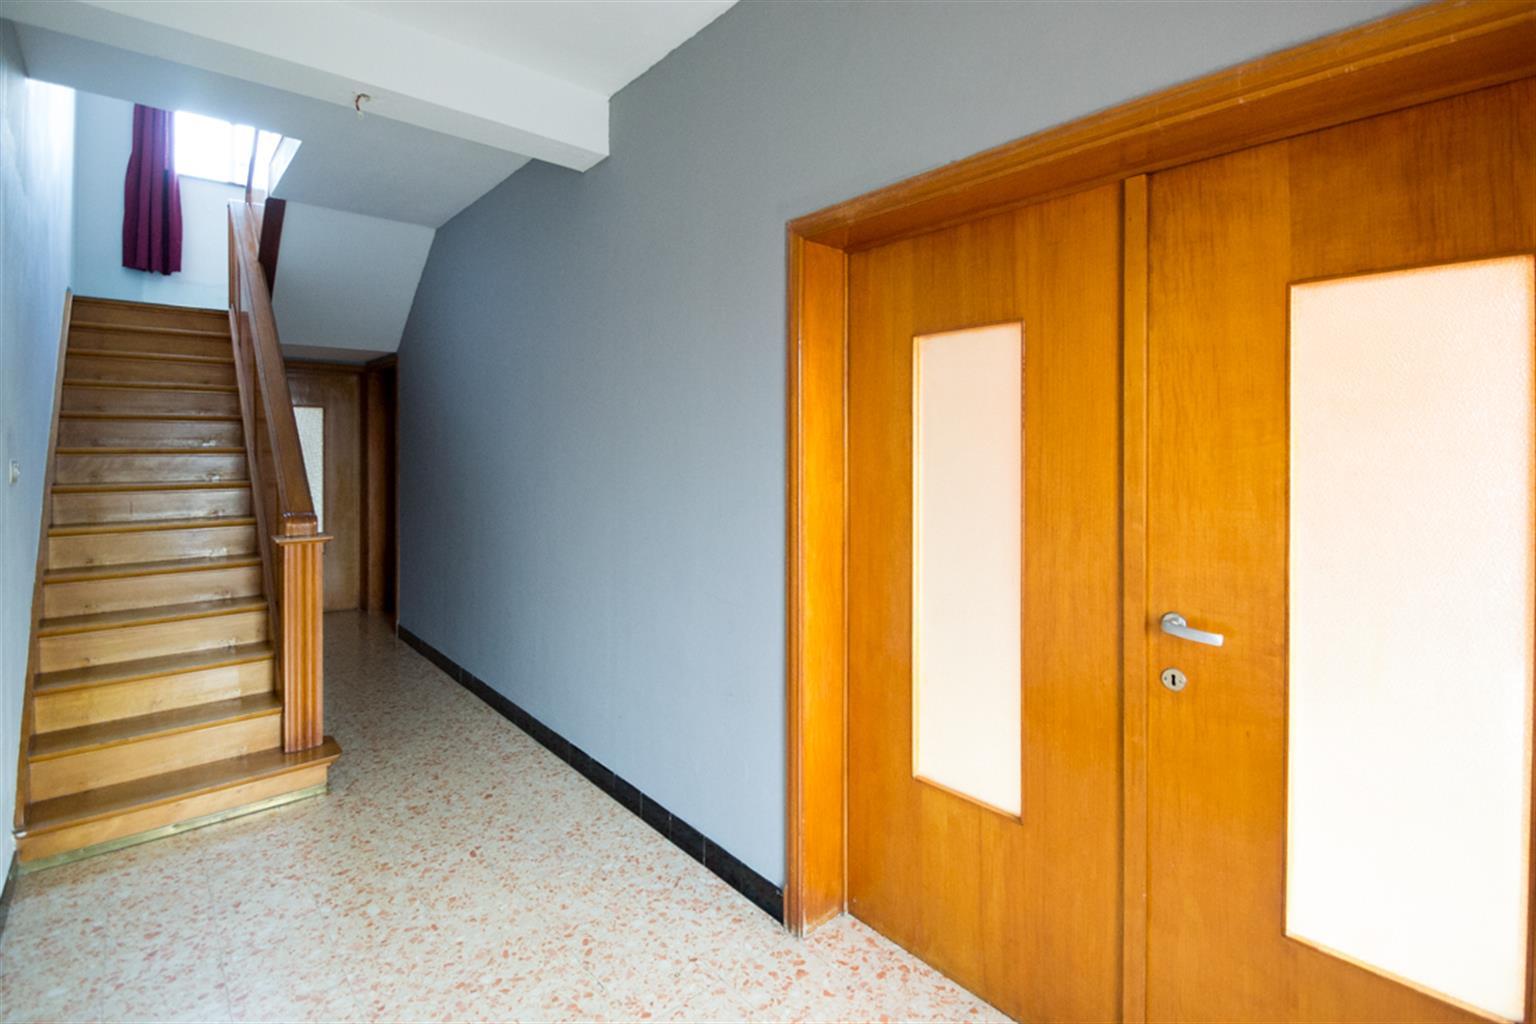 Maison - Houdeng-Aimeries - #4295574-1